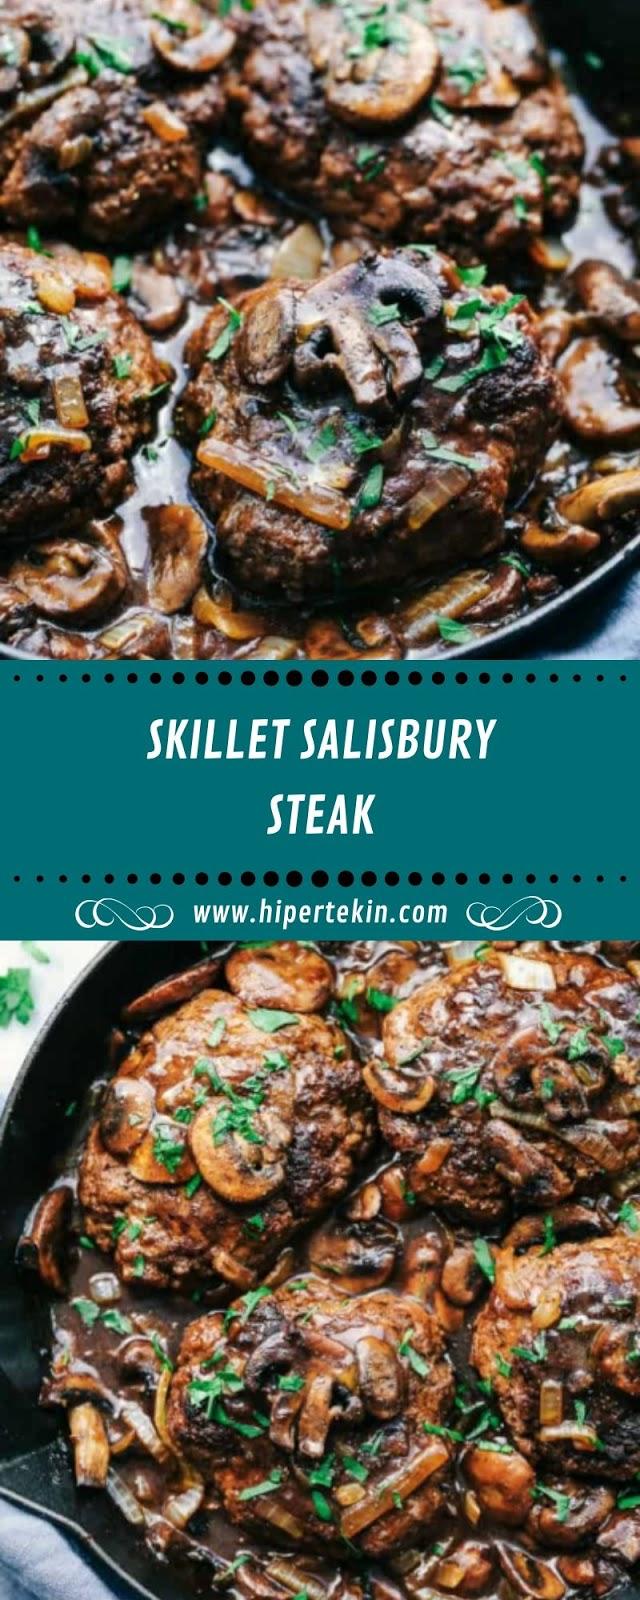 SKILLET SALISBURY STEAK